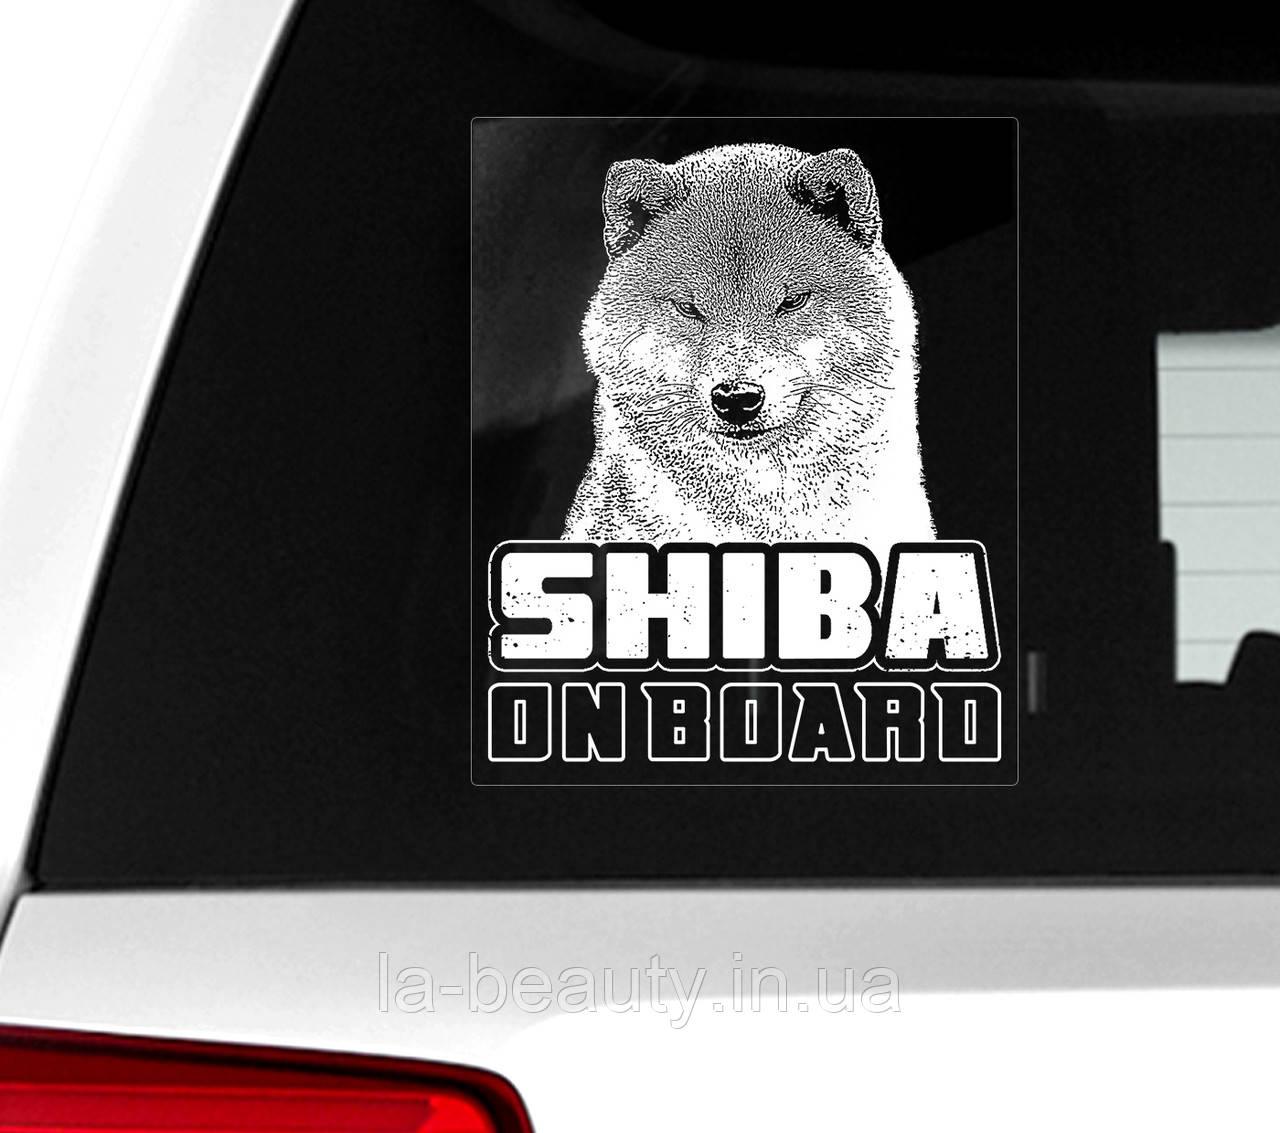 Наклейка на авто / машину Сиба-ину на борту (Shiba on board)